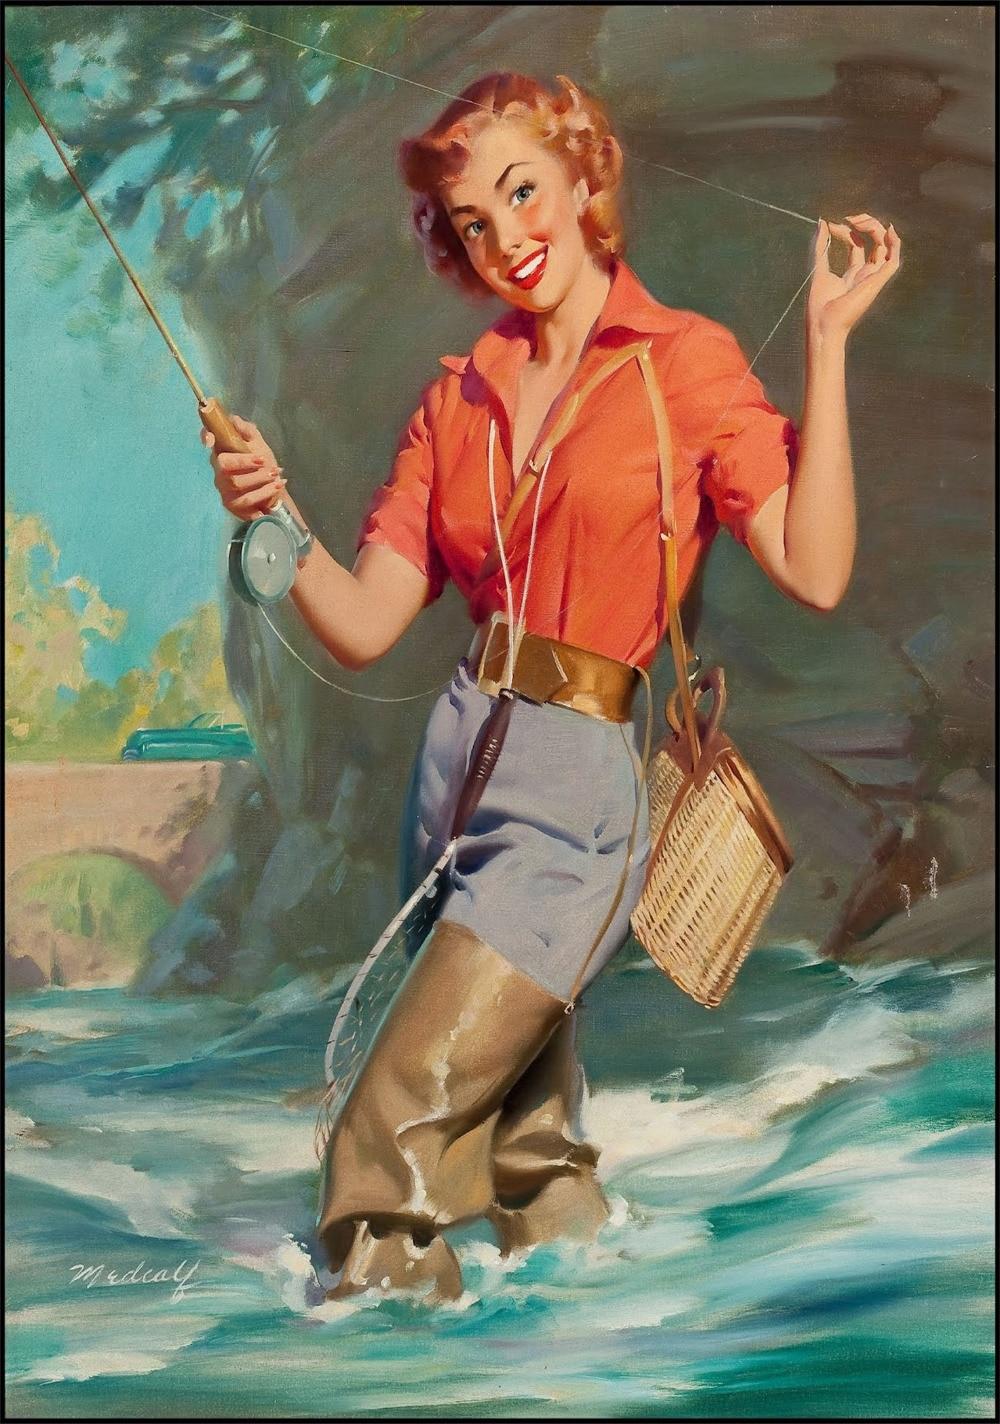 Aliexpress.com : Buy Marilyn Monroe Pin Up Girl Pop Art Propaganda ...